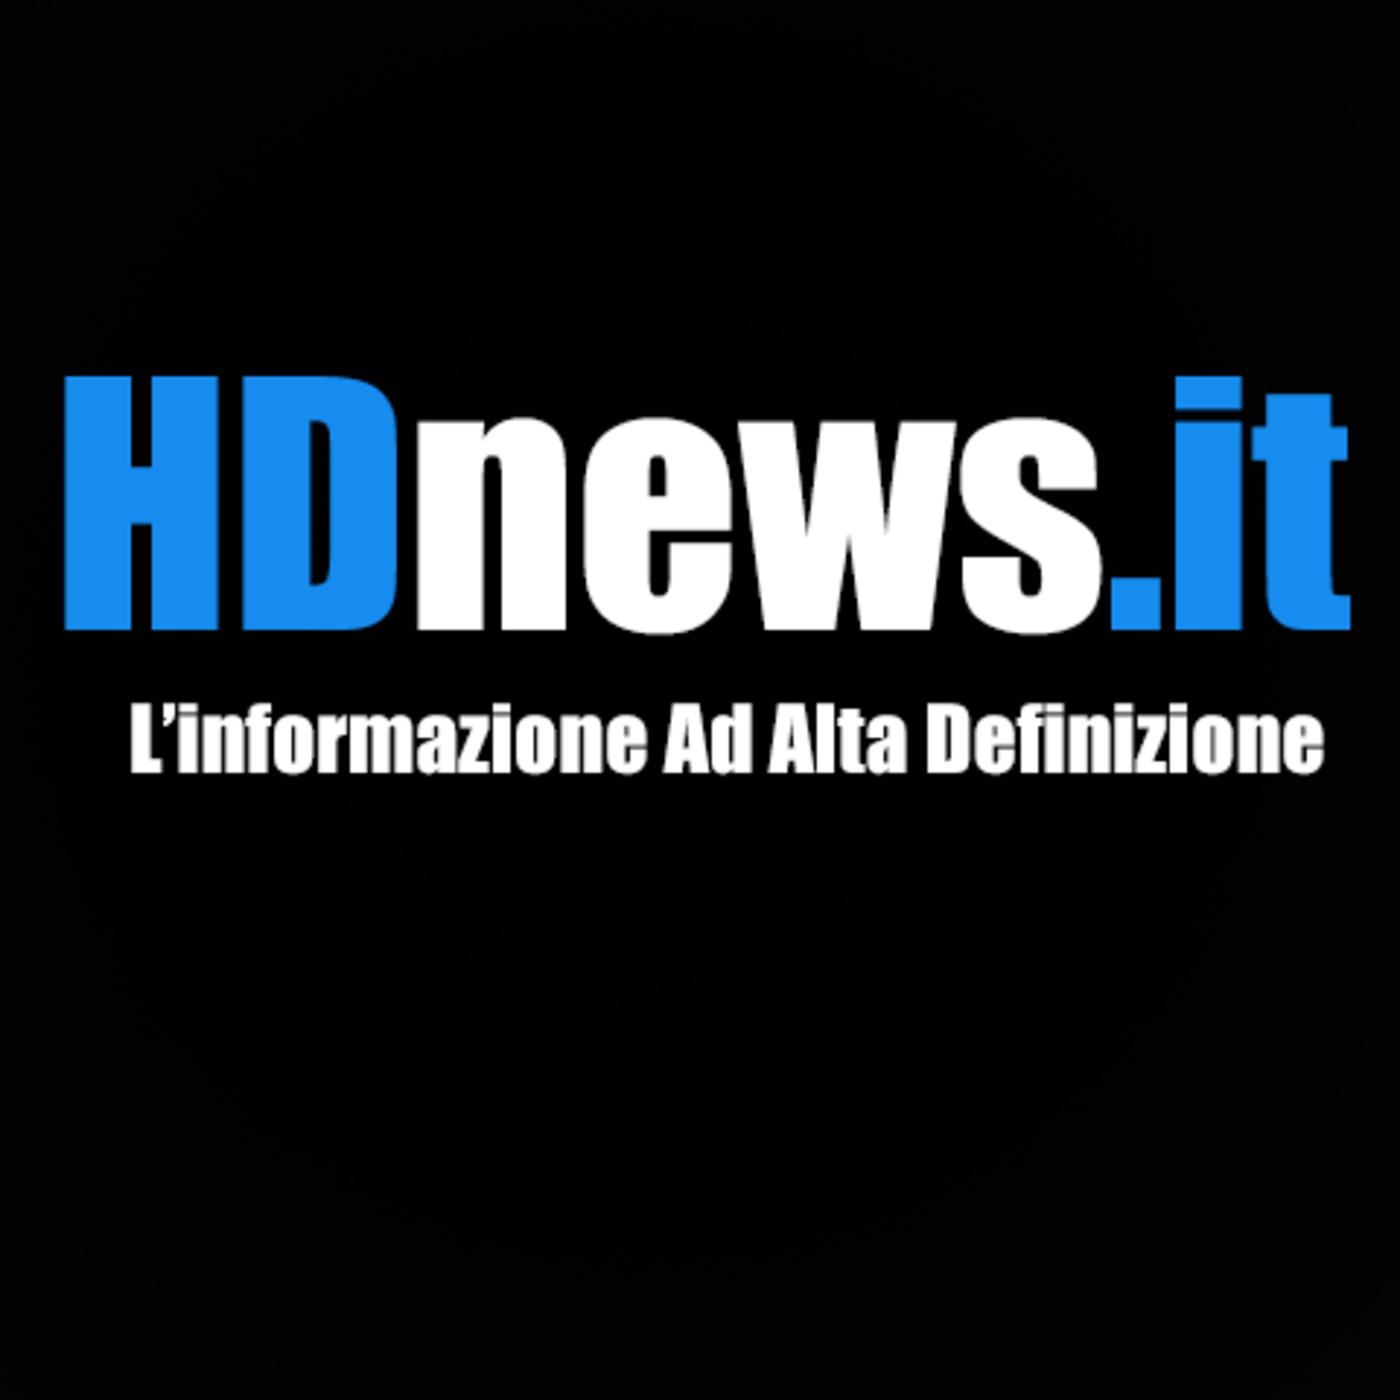 HDnews.it Radio